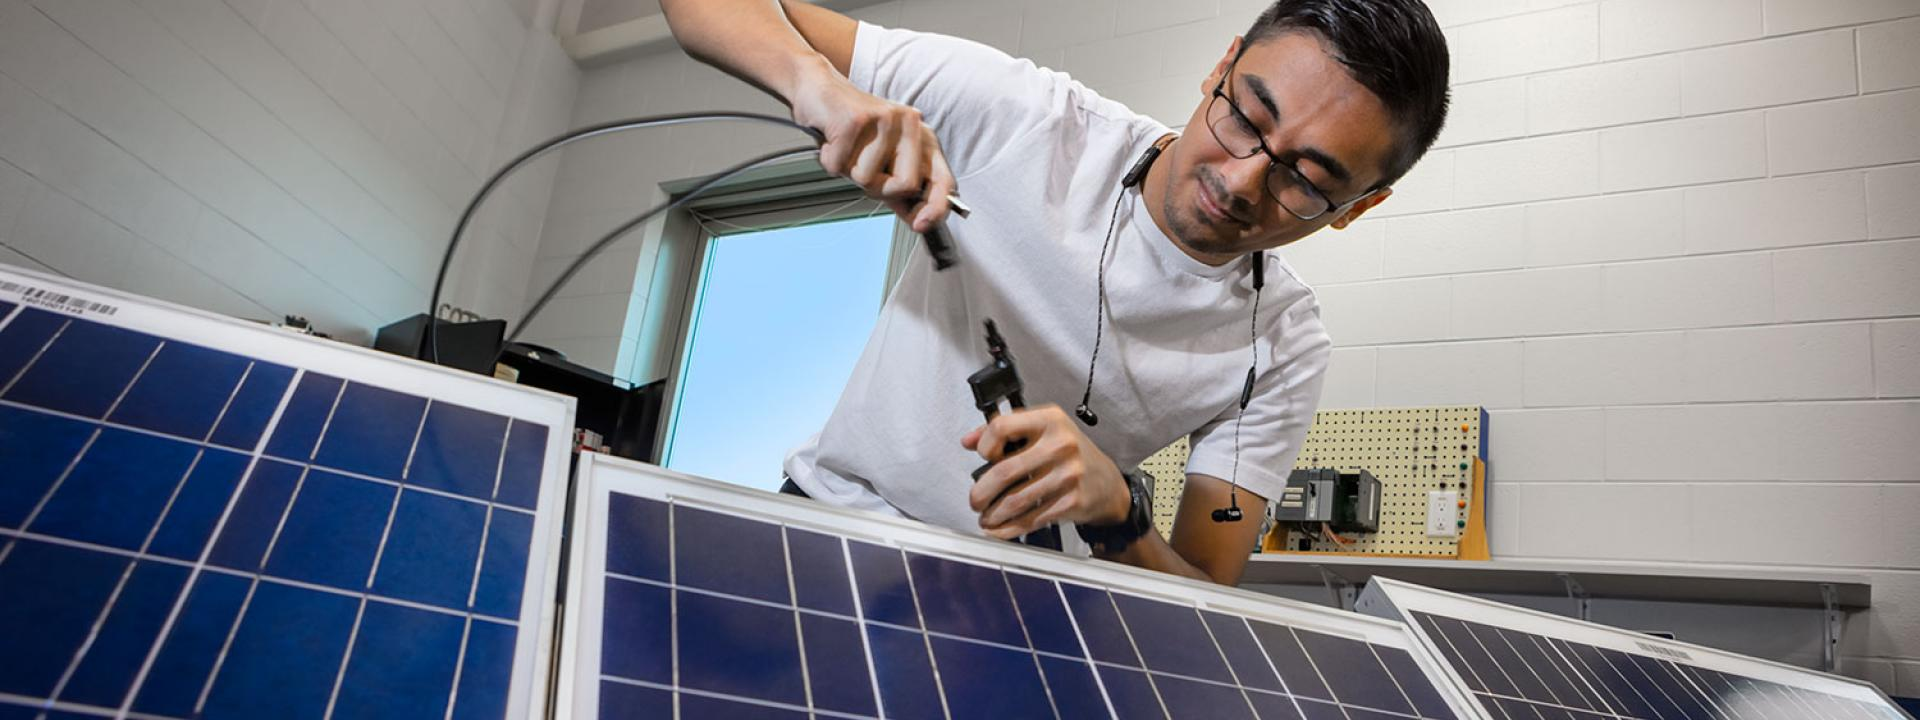 Engineering Student working on solar panels